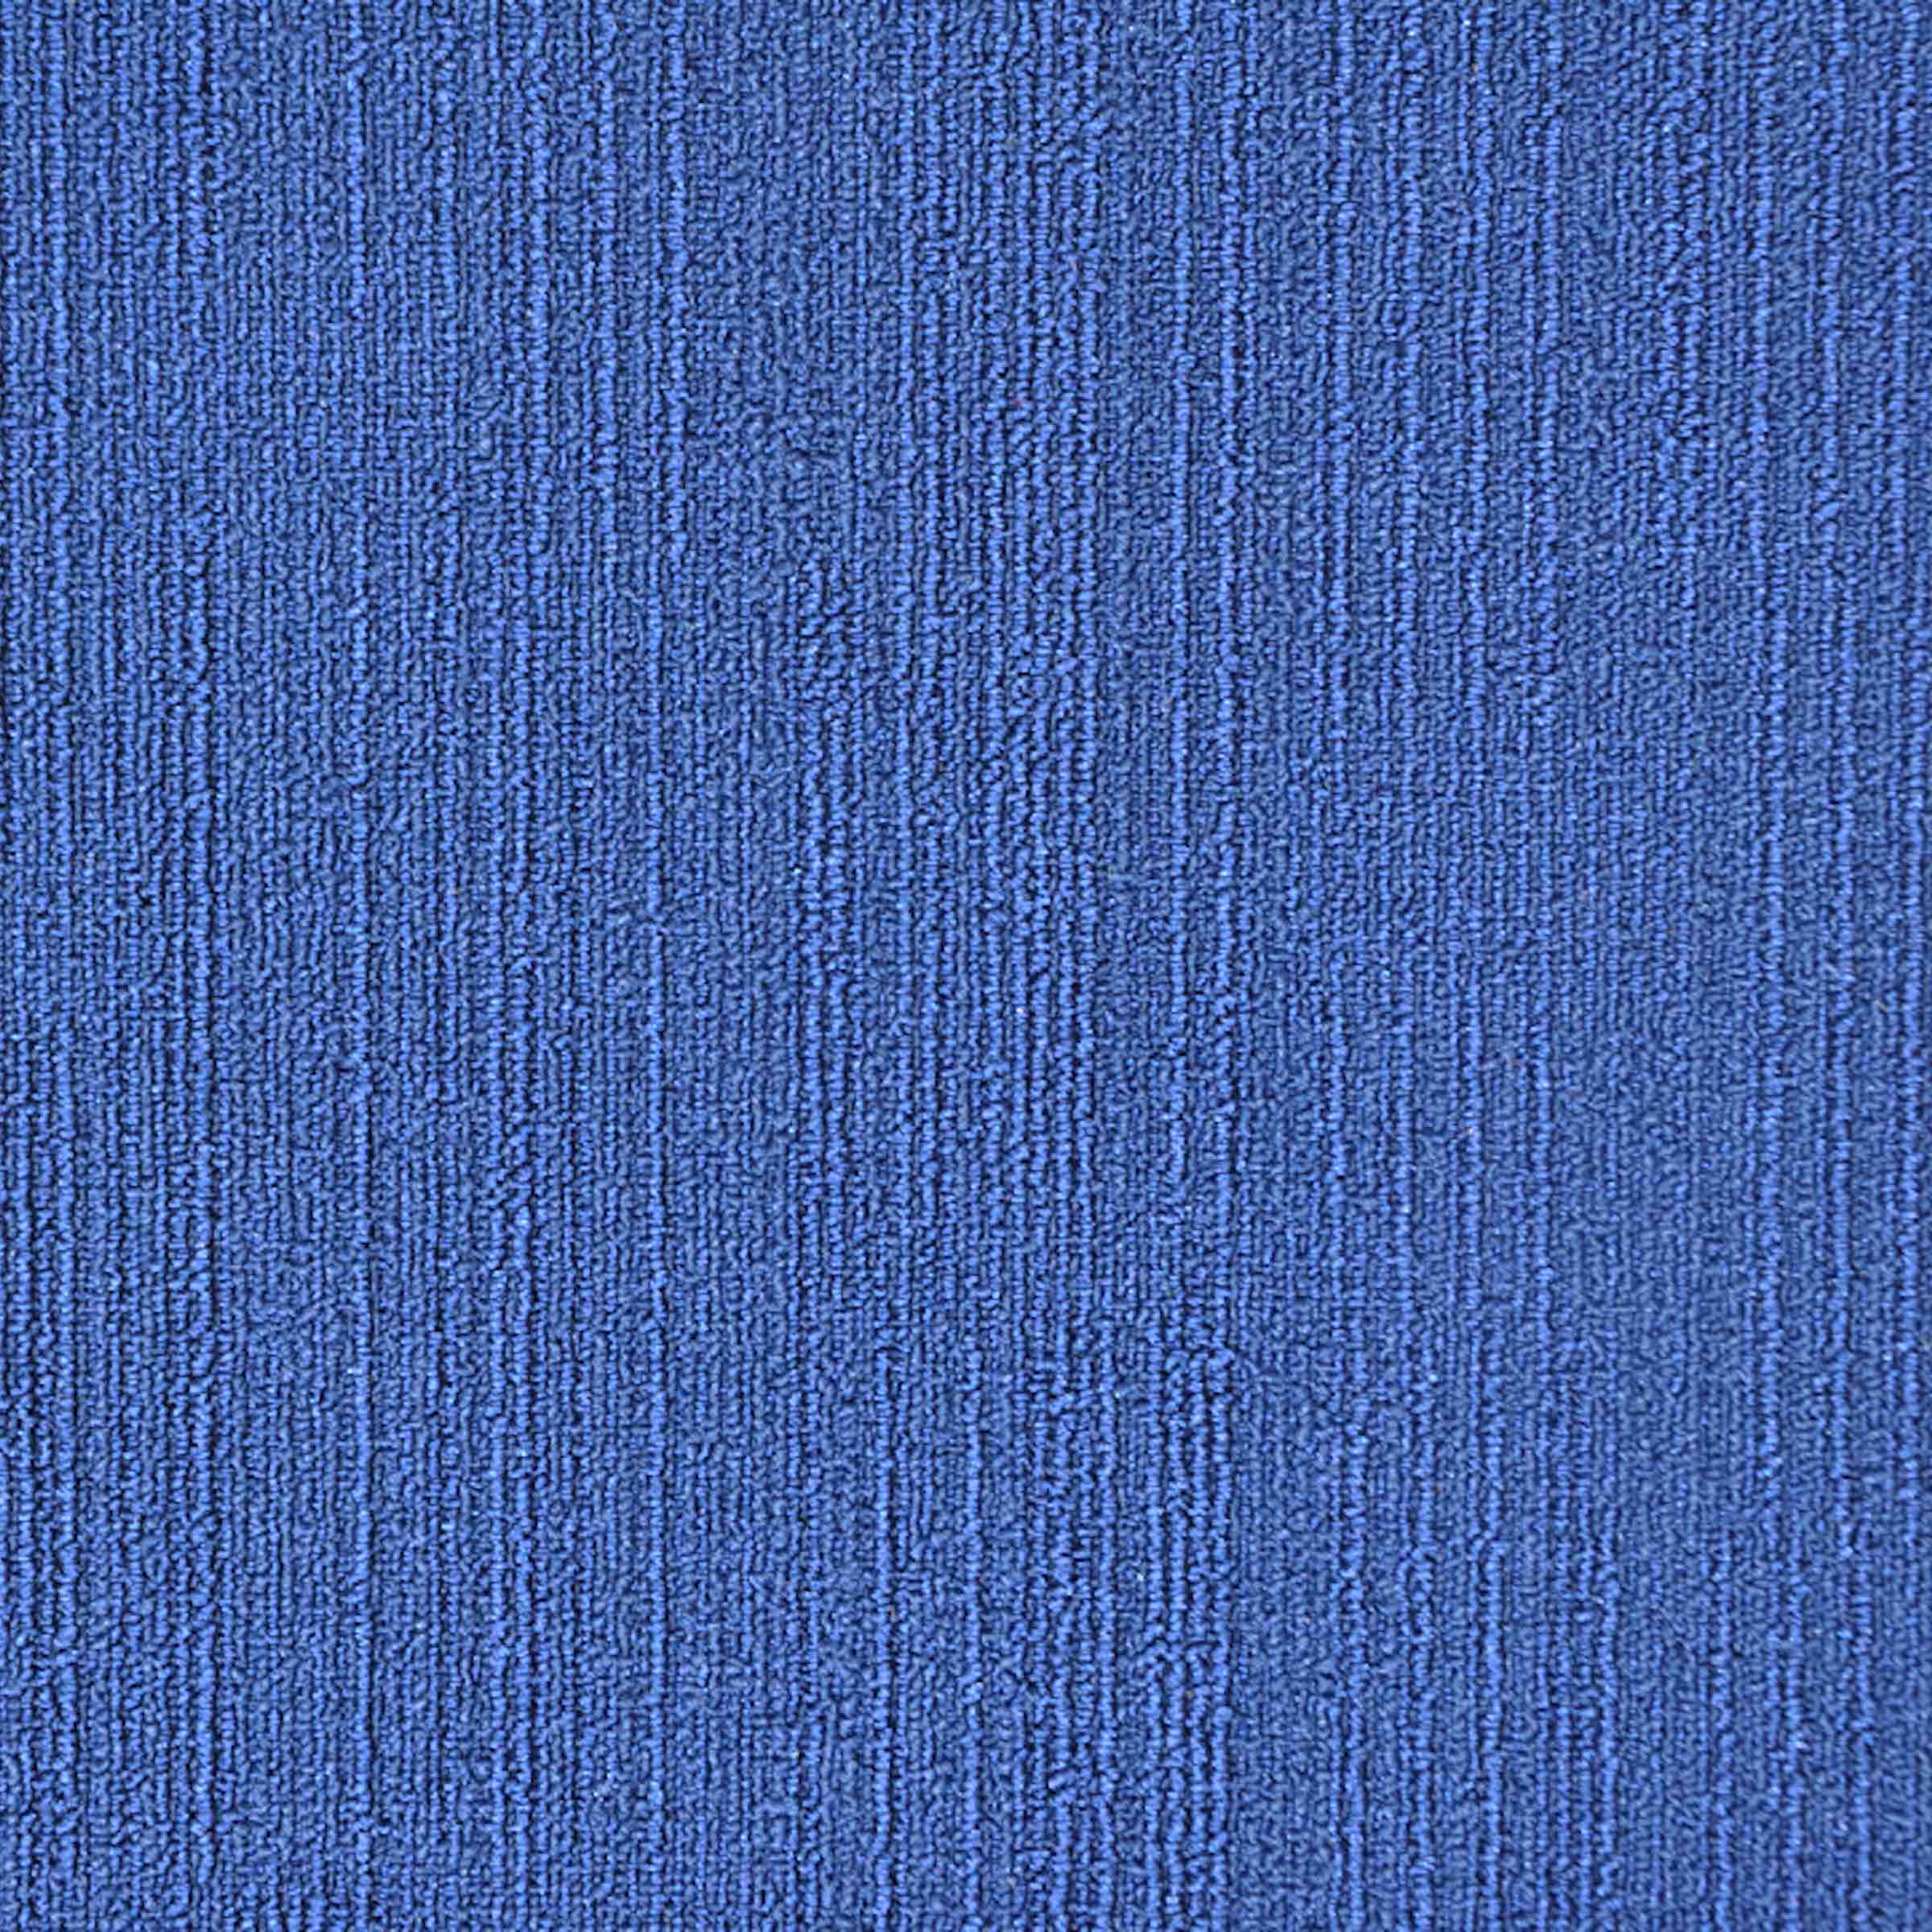 Highlights 3 Multi-Level | 65123 | Paragon Carpet Tiles | Commercial Carpet Tiles